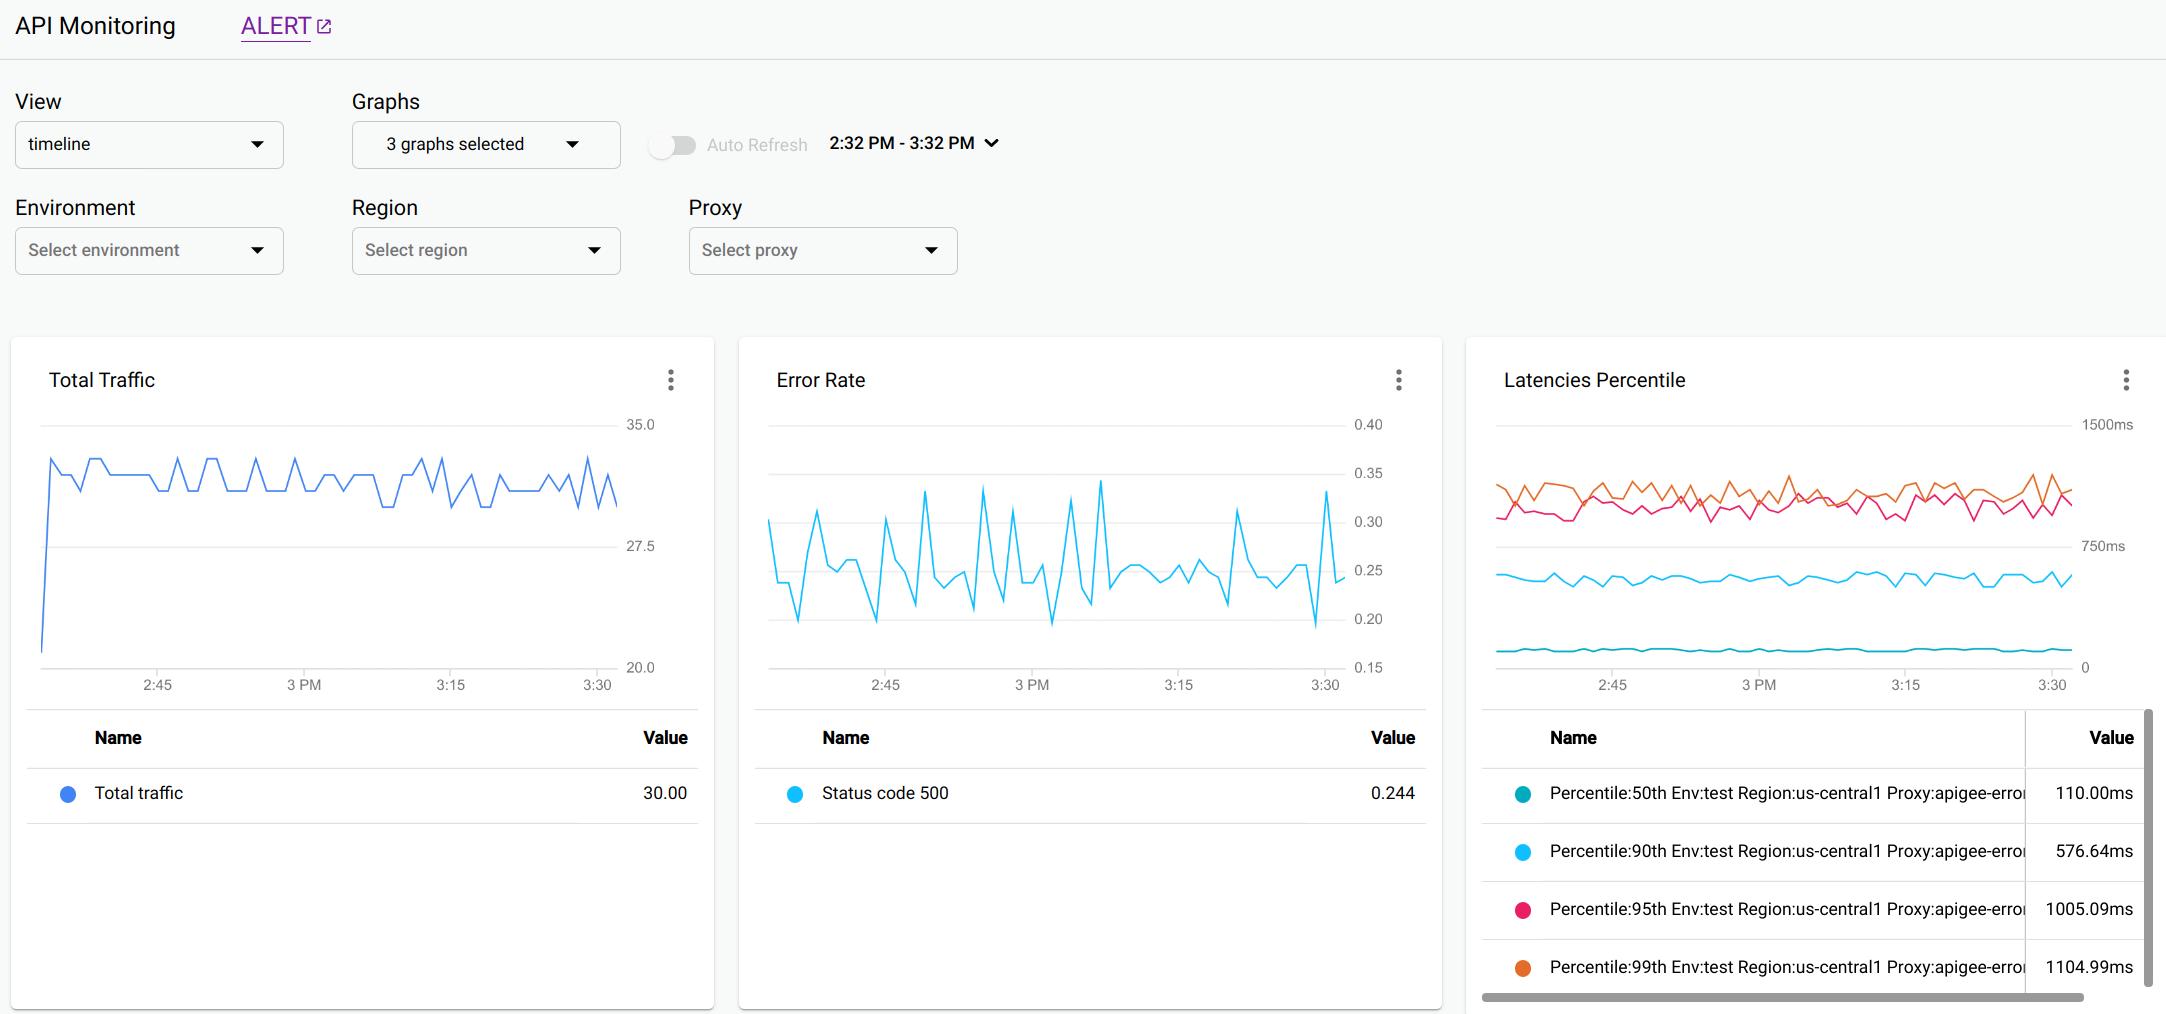 API Monitoring timeline view